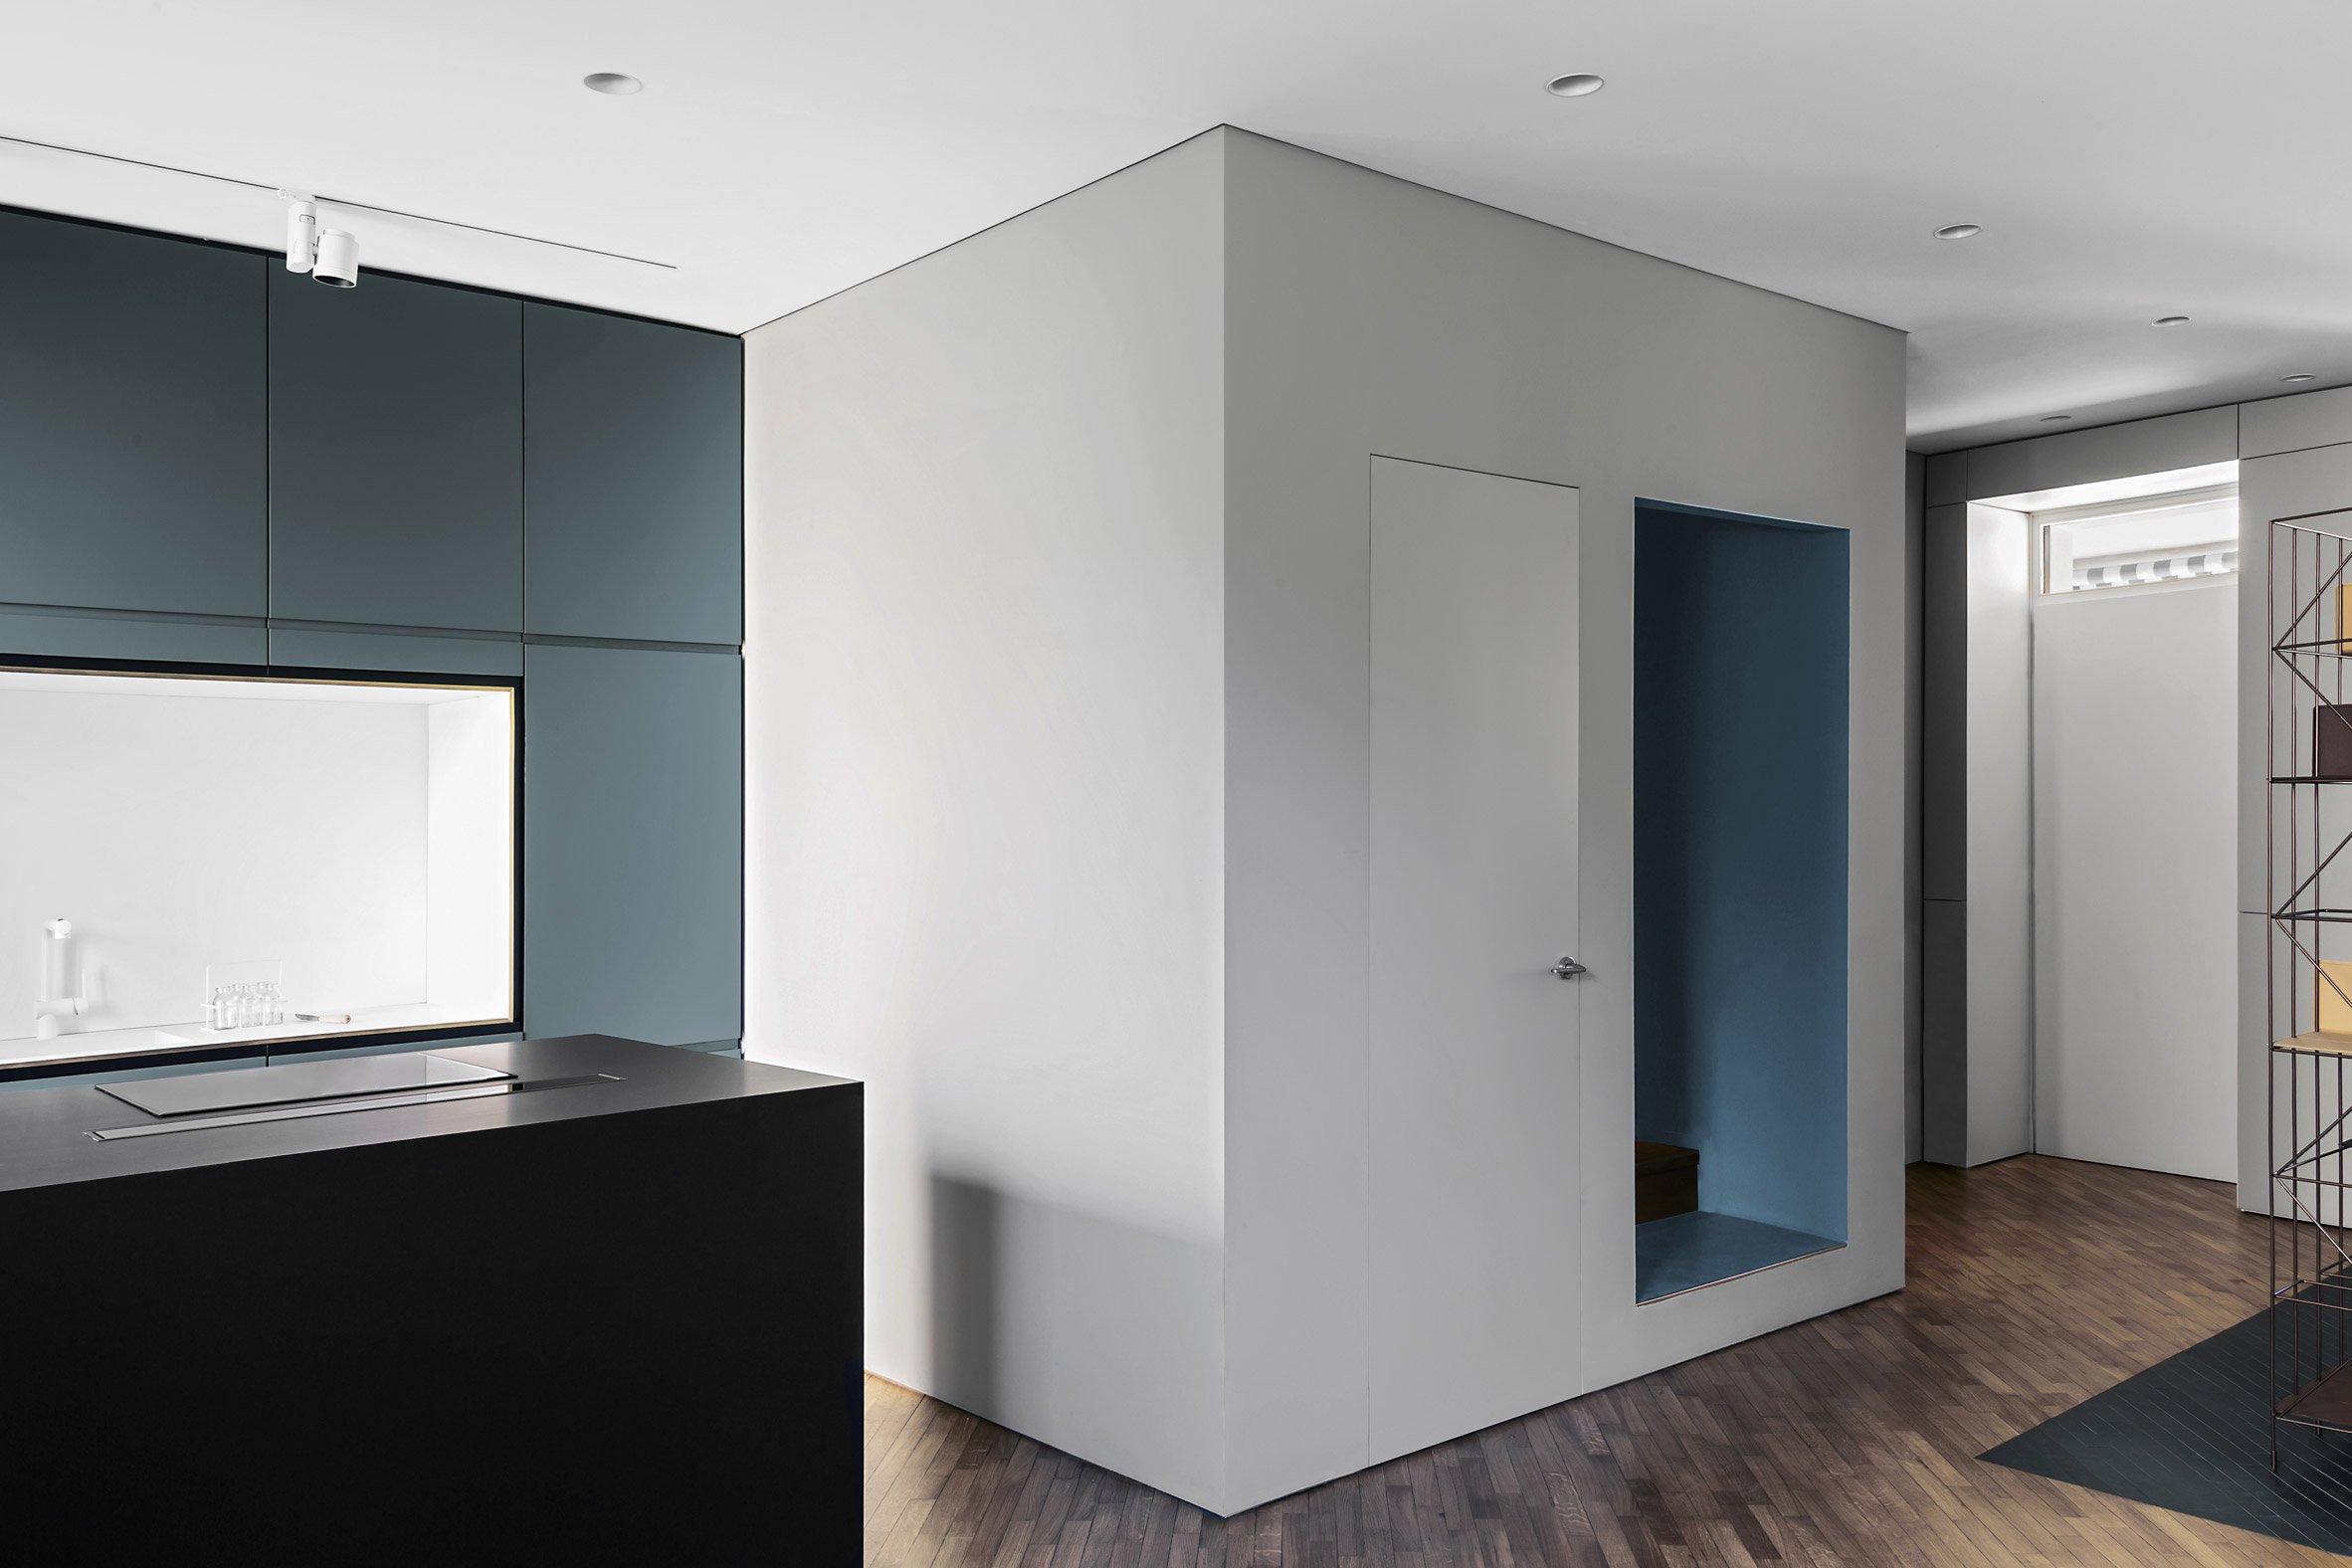 architecture-house-residential-design-studia-interiors-osnovadesign-osnova-poltava_13